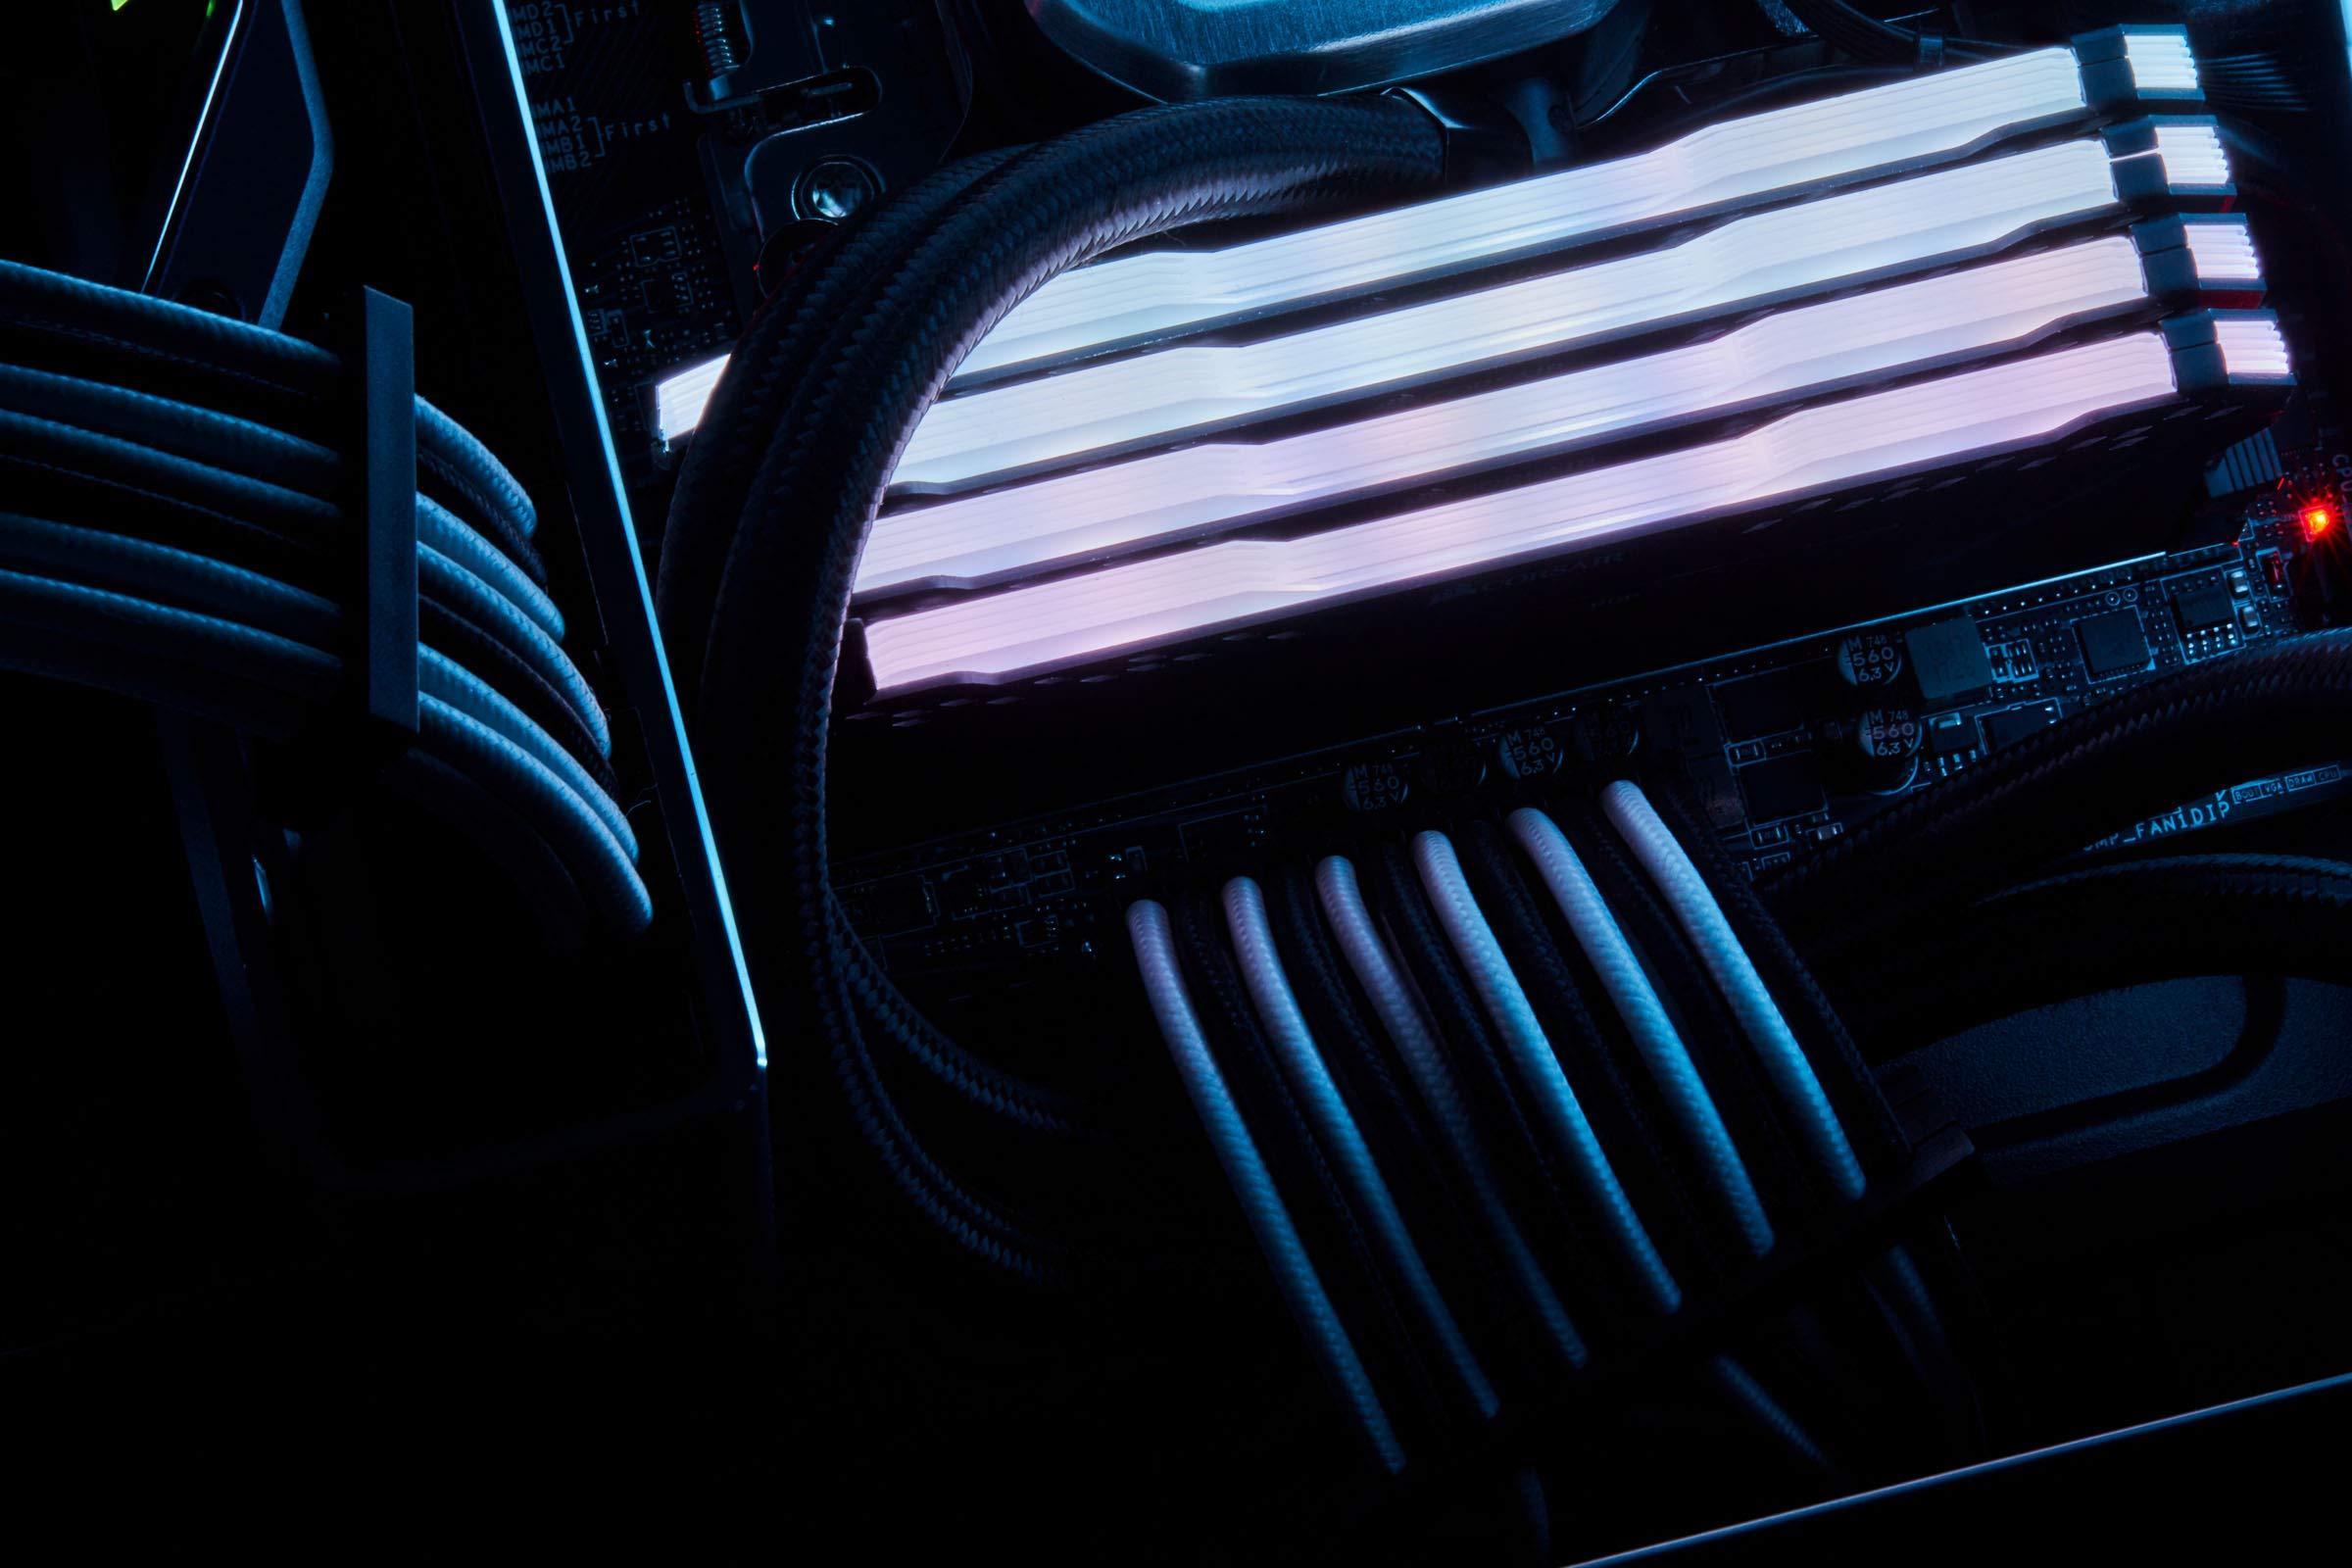 CORSAIR Premium Individually Sleeved PSU Cables Starter Kit - Black, 2 Yr Warranty, for Corsair PSUs by Corsair (Image #14)